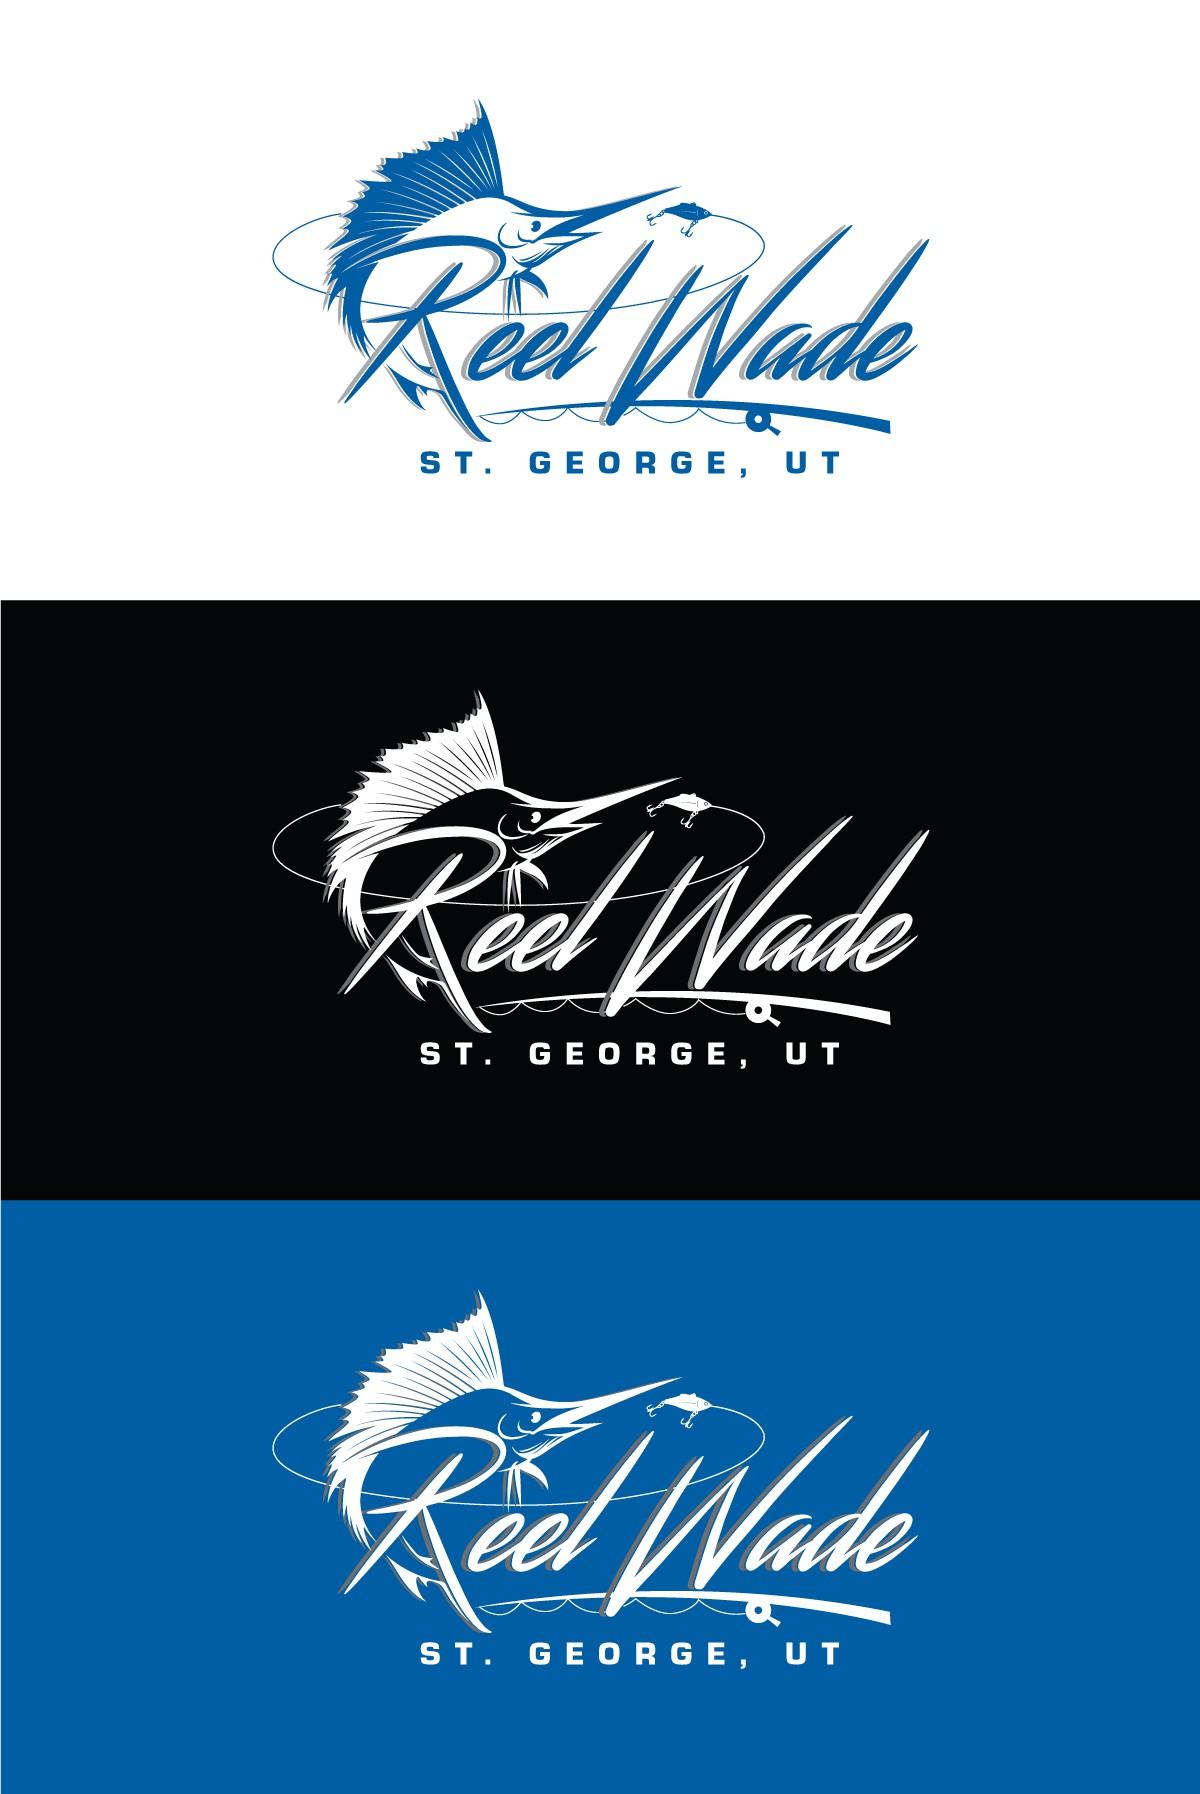 Reel Wade